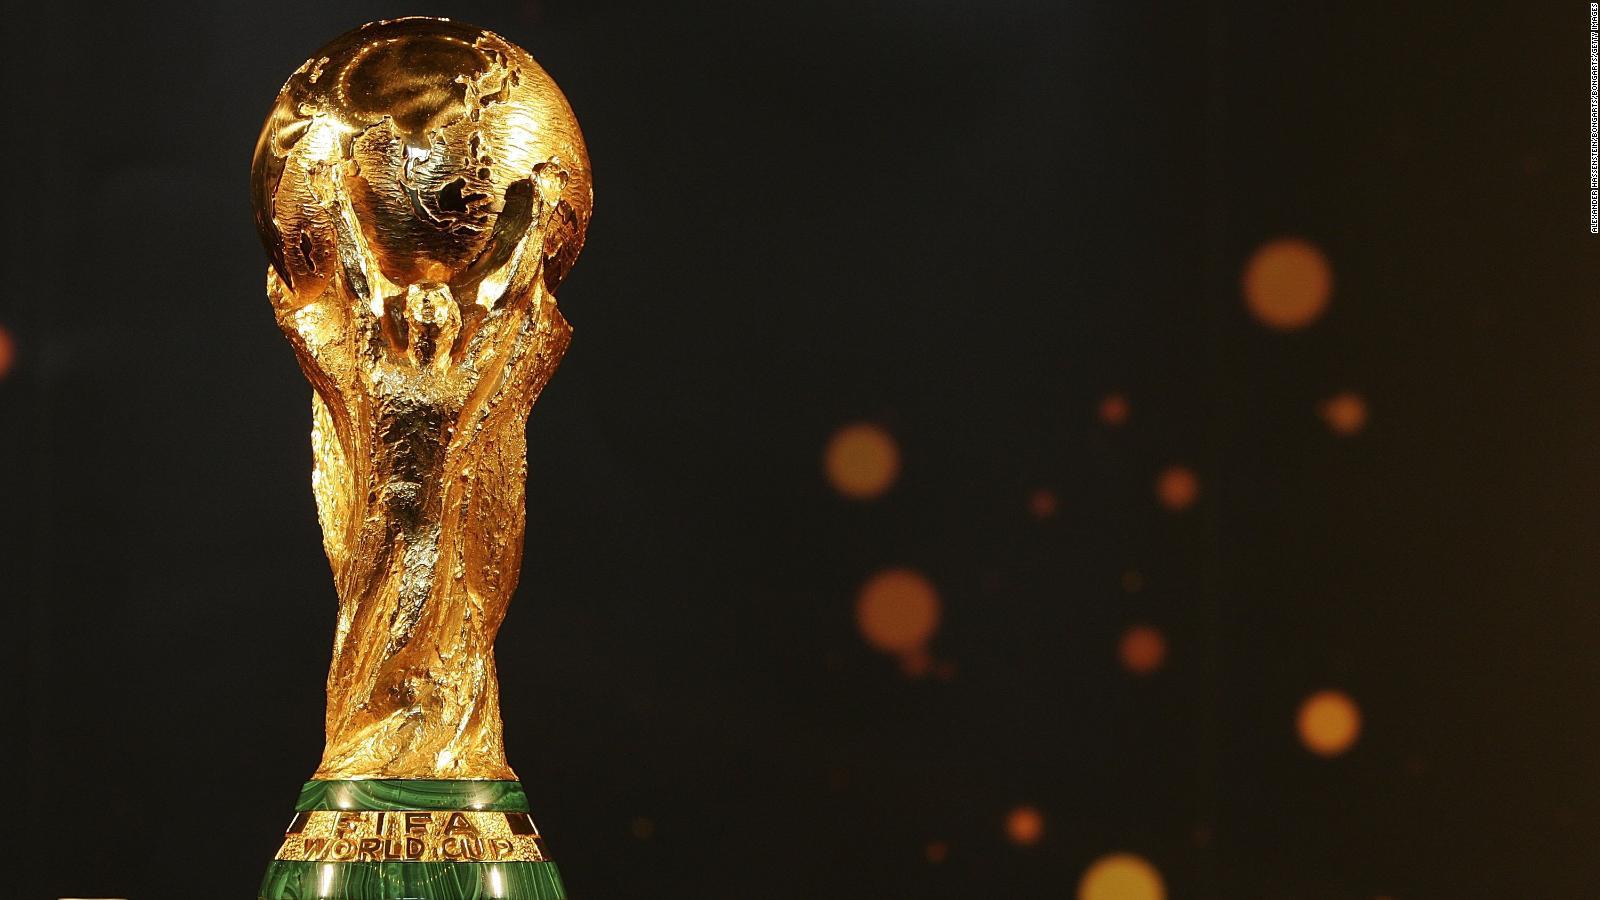 russia world cup 2018: the start of a new era for serbian football - cnn